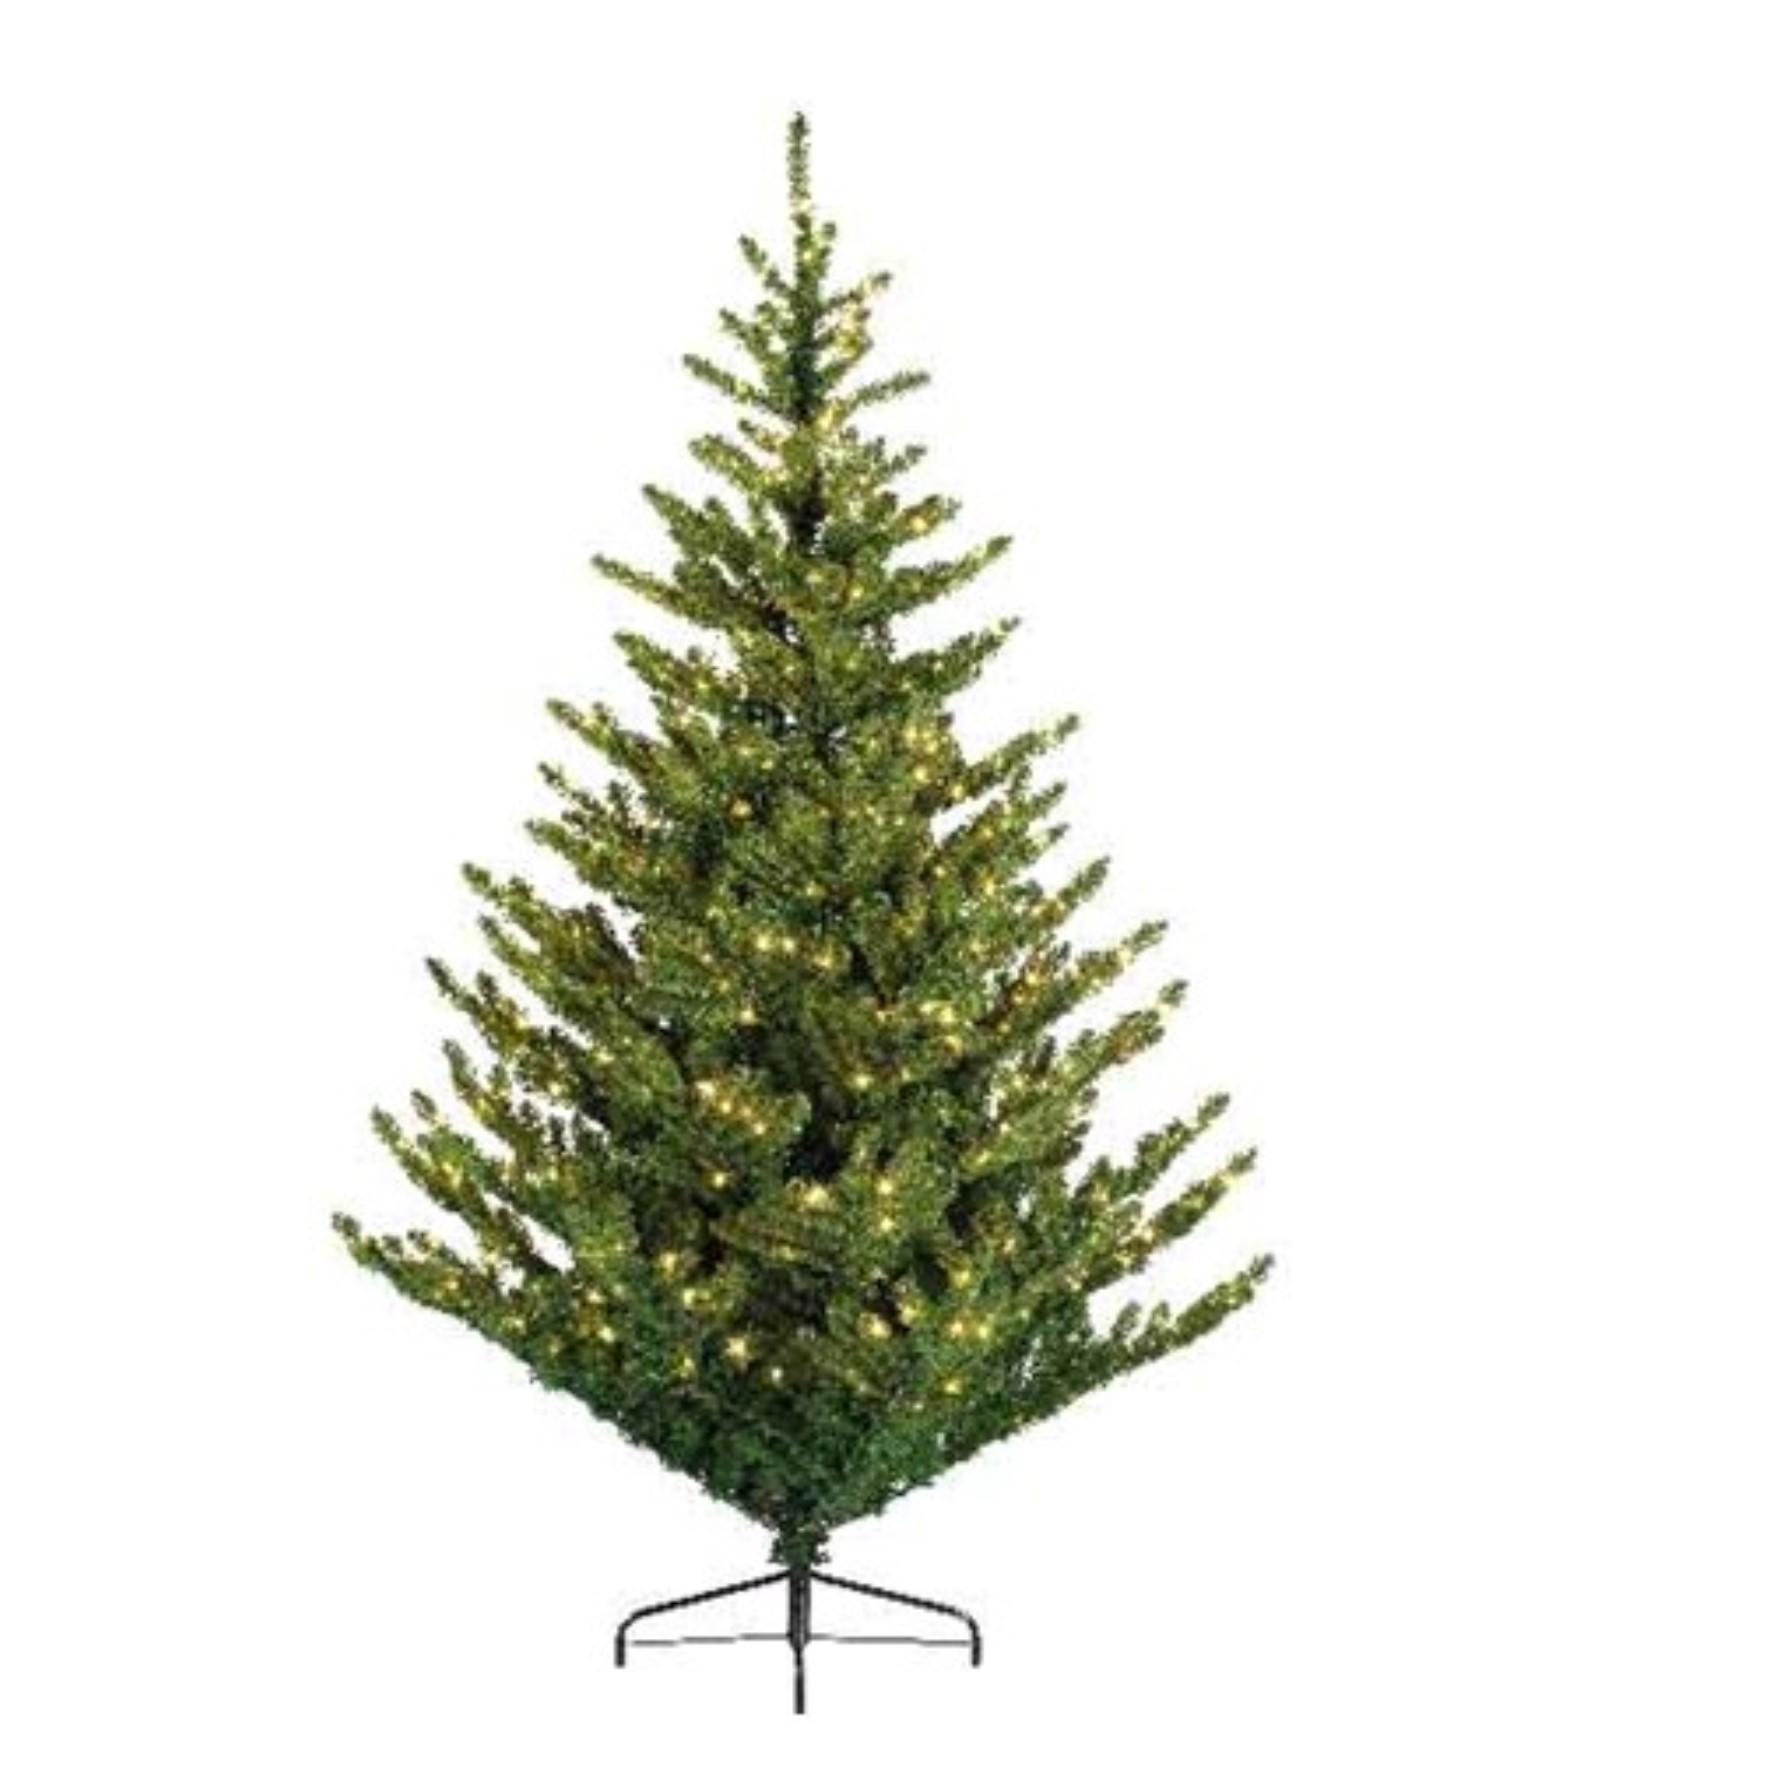 Liberty Spruce Prelit Tree